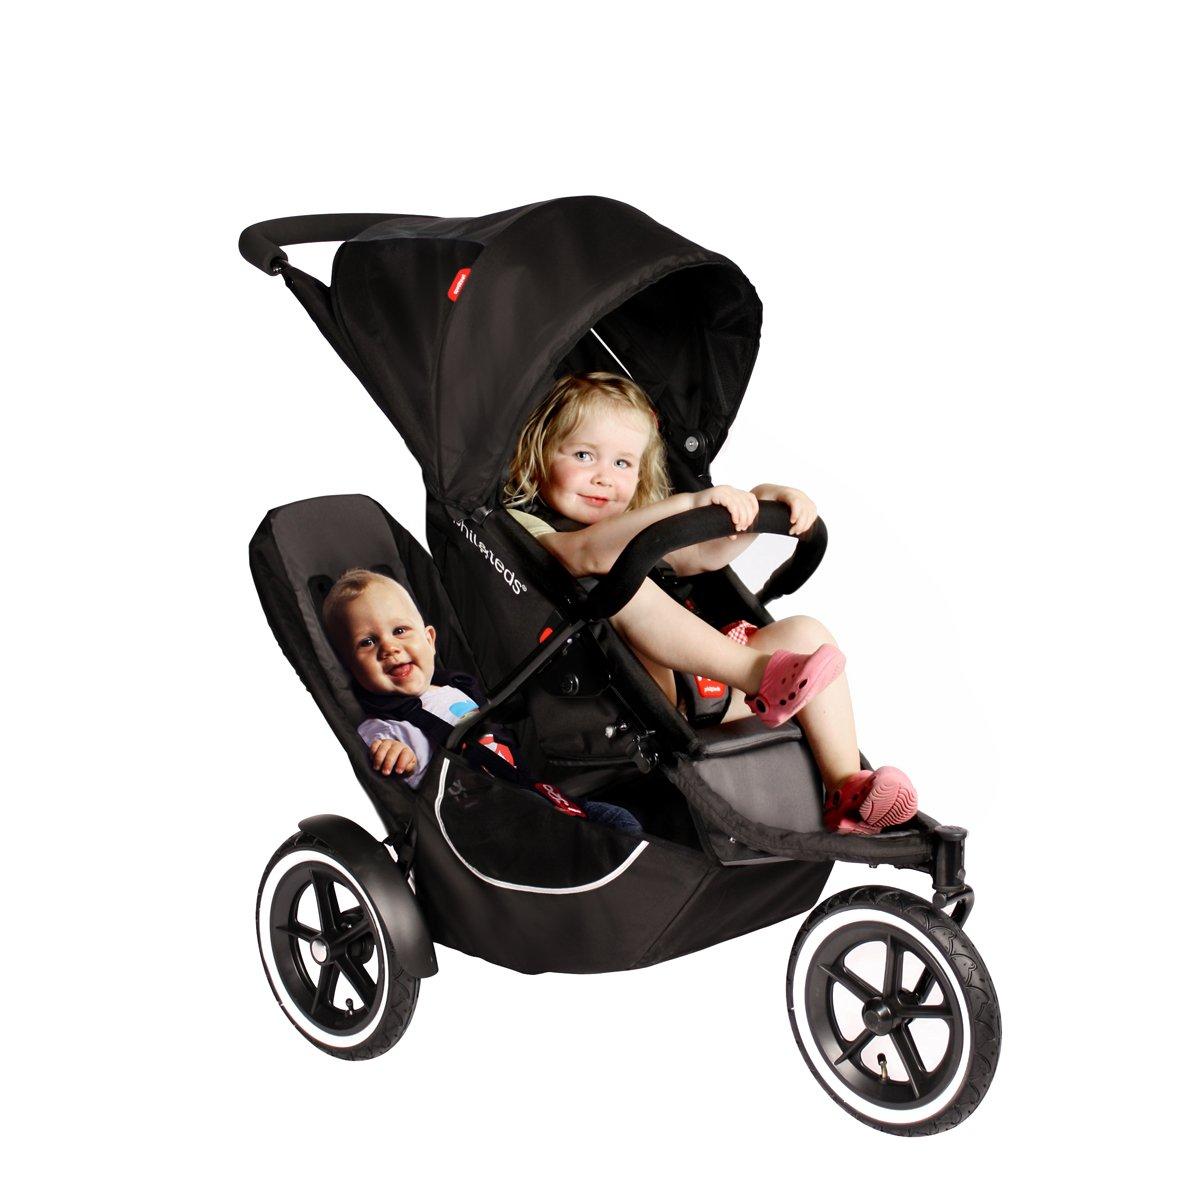 Amazon.com: Phil & Teds Classic carriola con doble kit: Baby